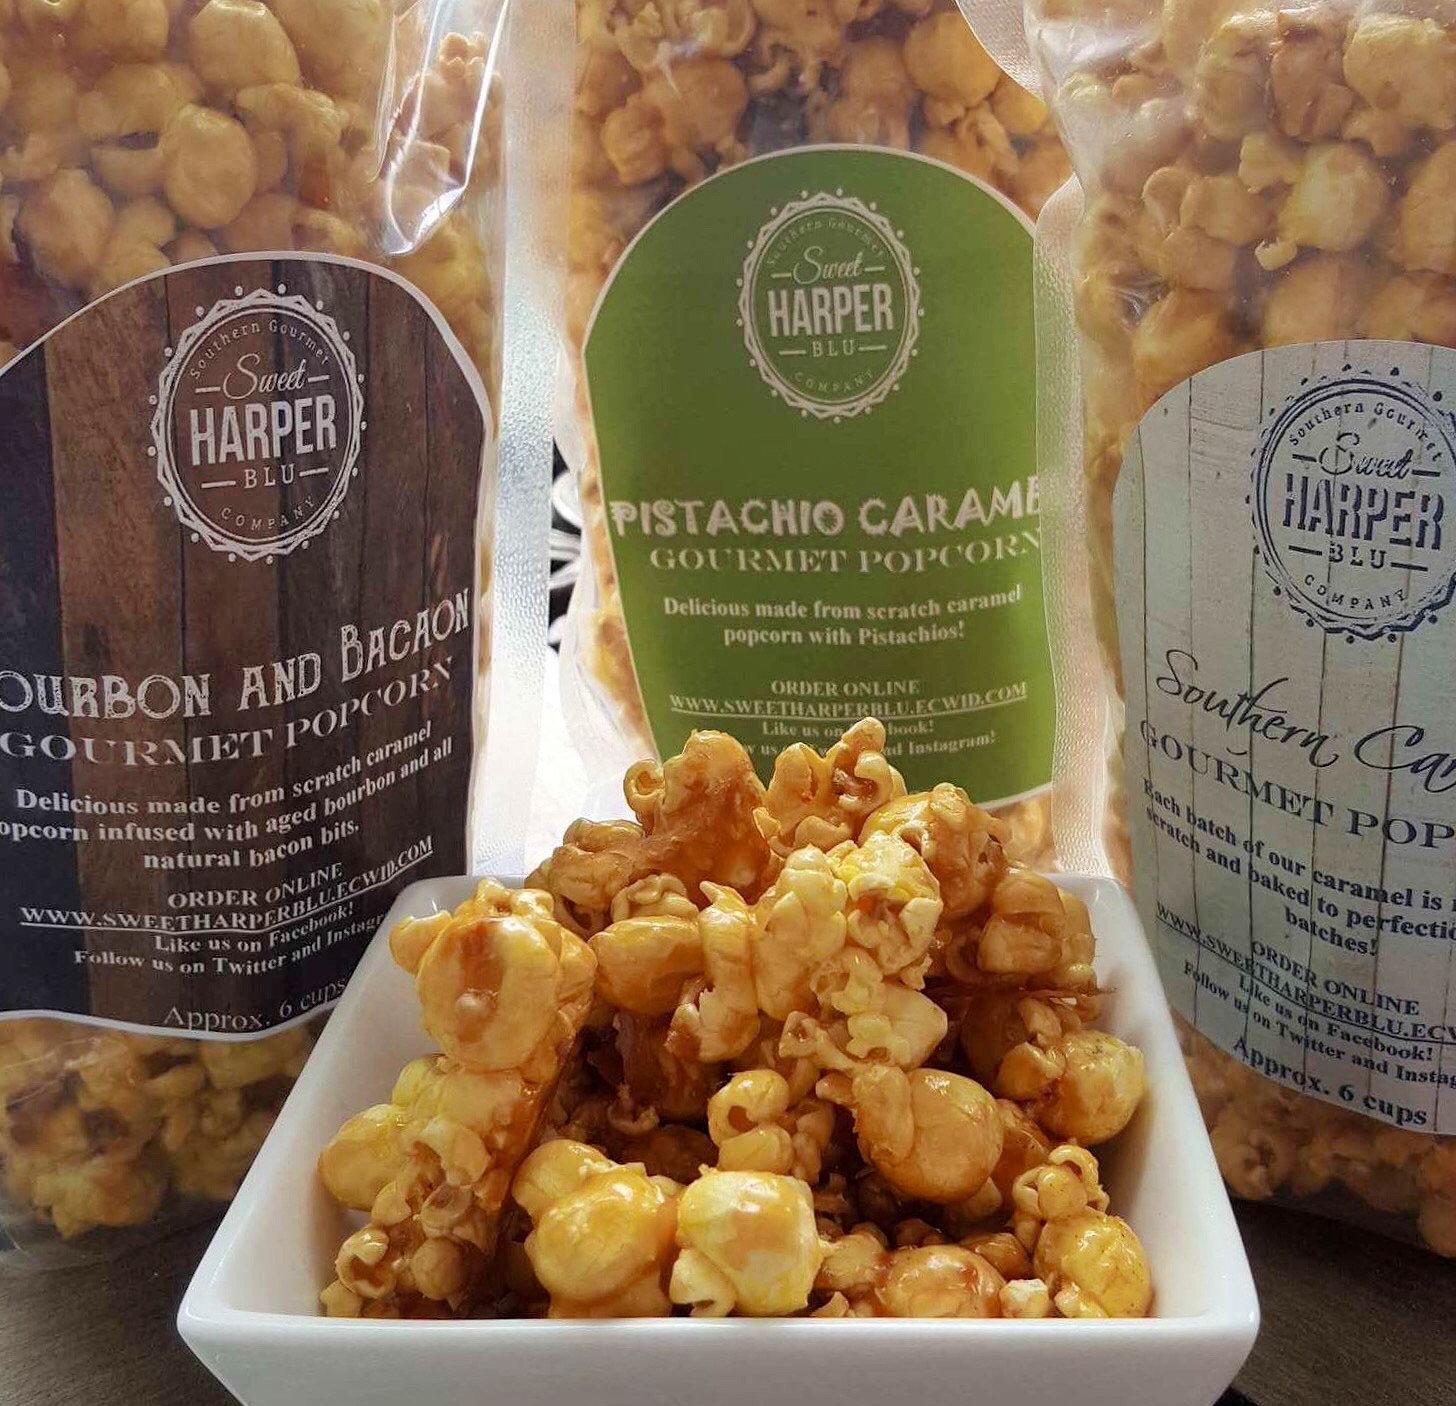 Pistachio Caramel Popcorn